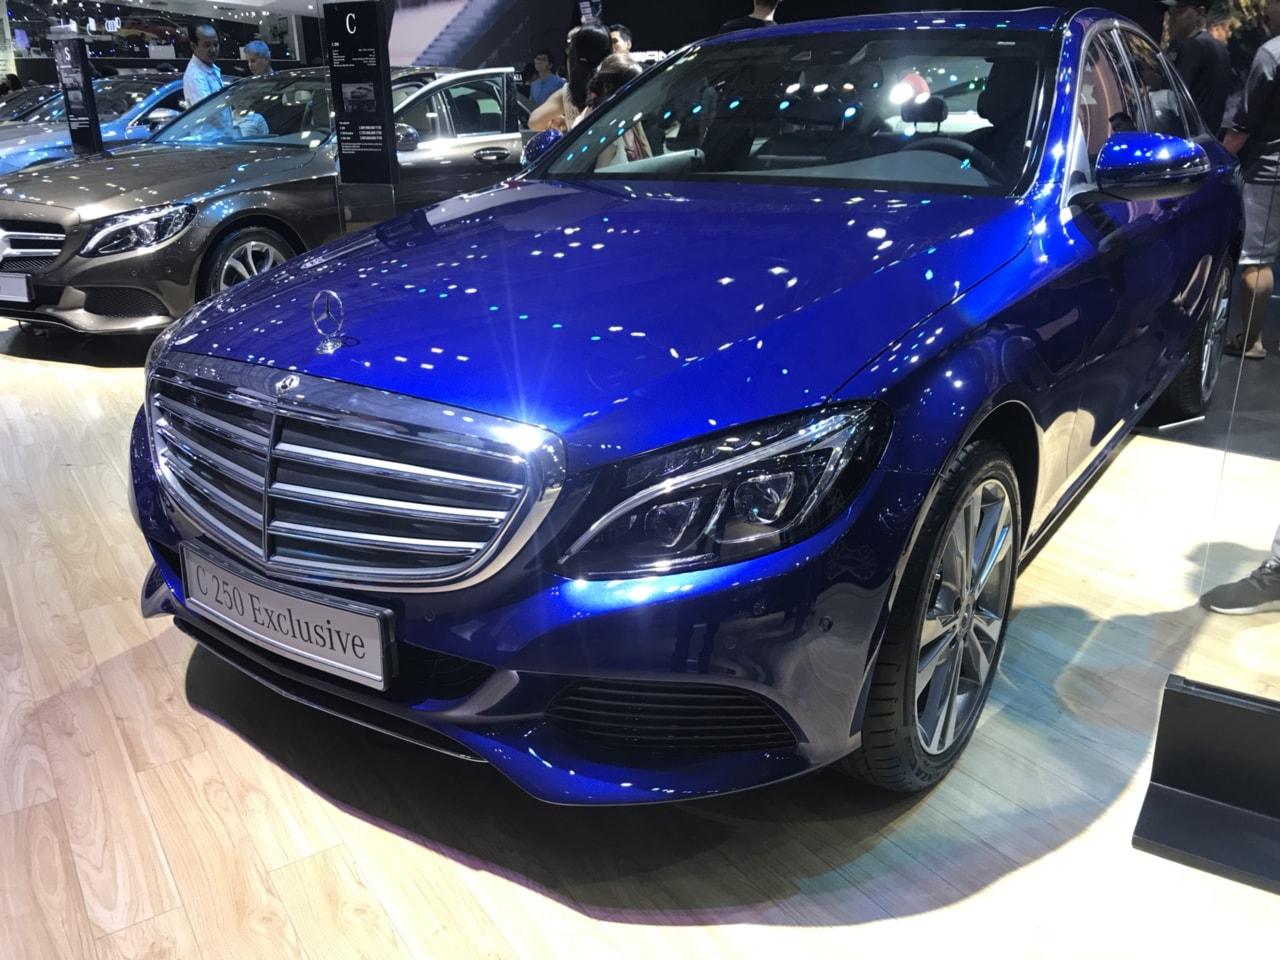 Mercedes C250 2018 2019 moi nhat (5)